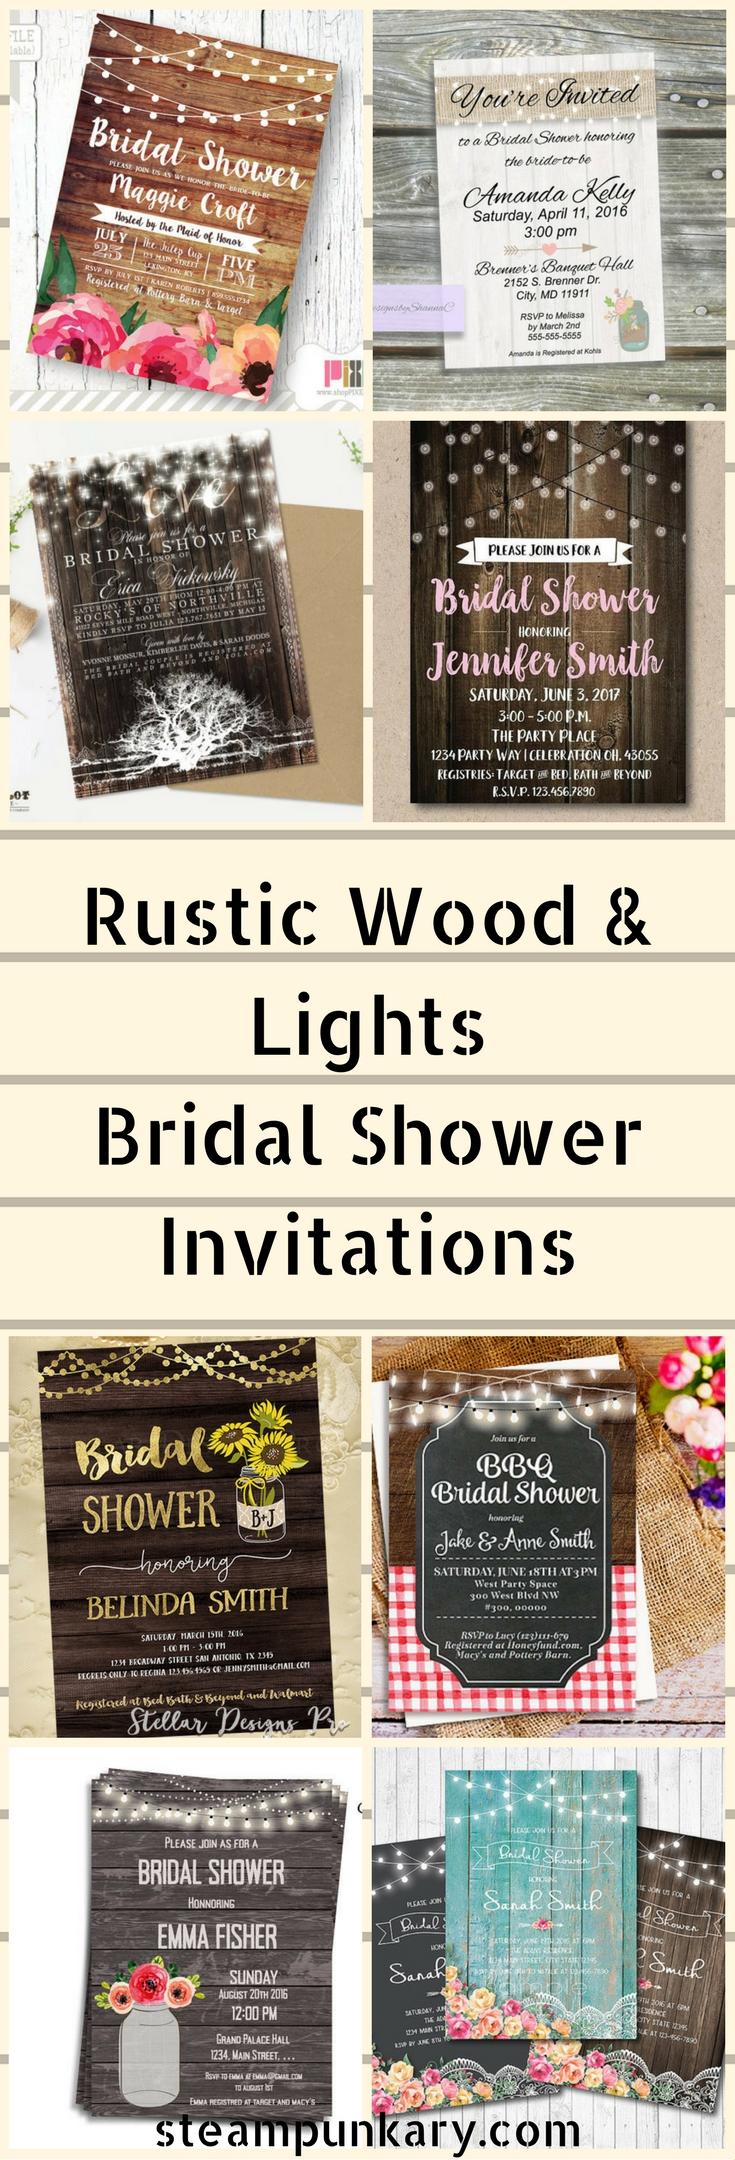 Rustic Wood & Lights Bridal Shower Invitations